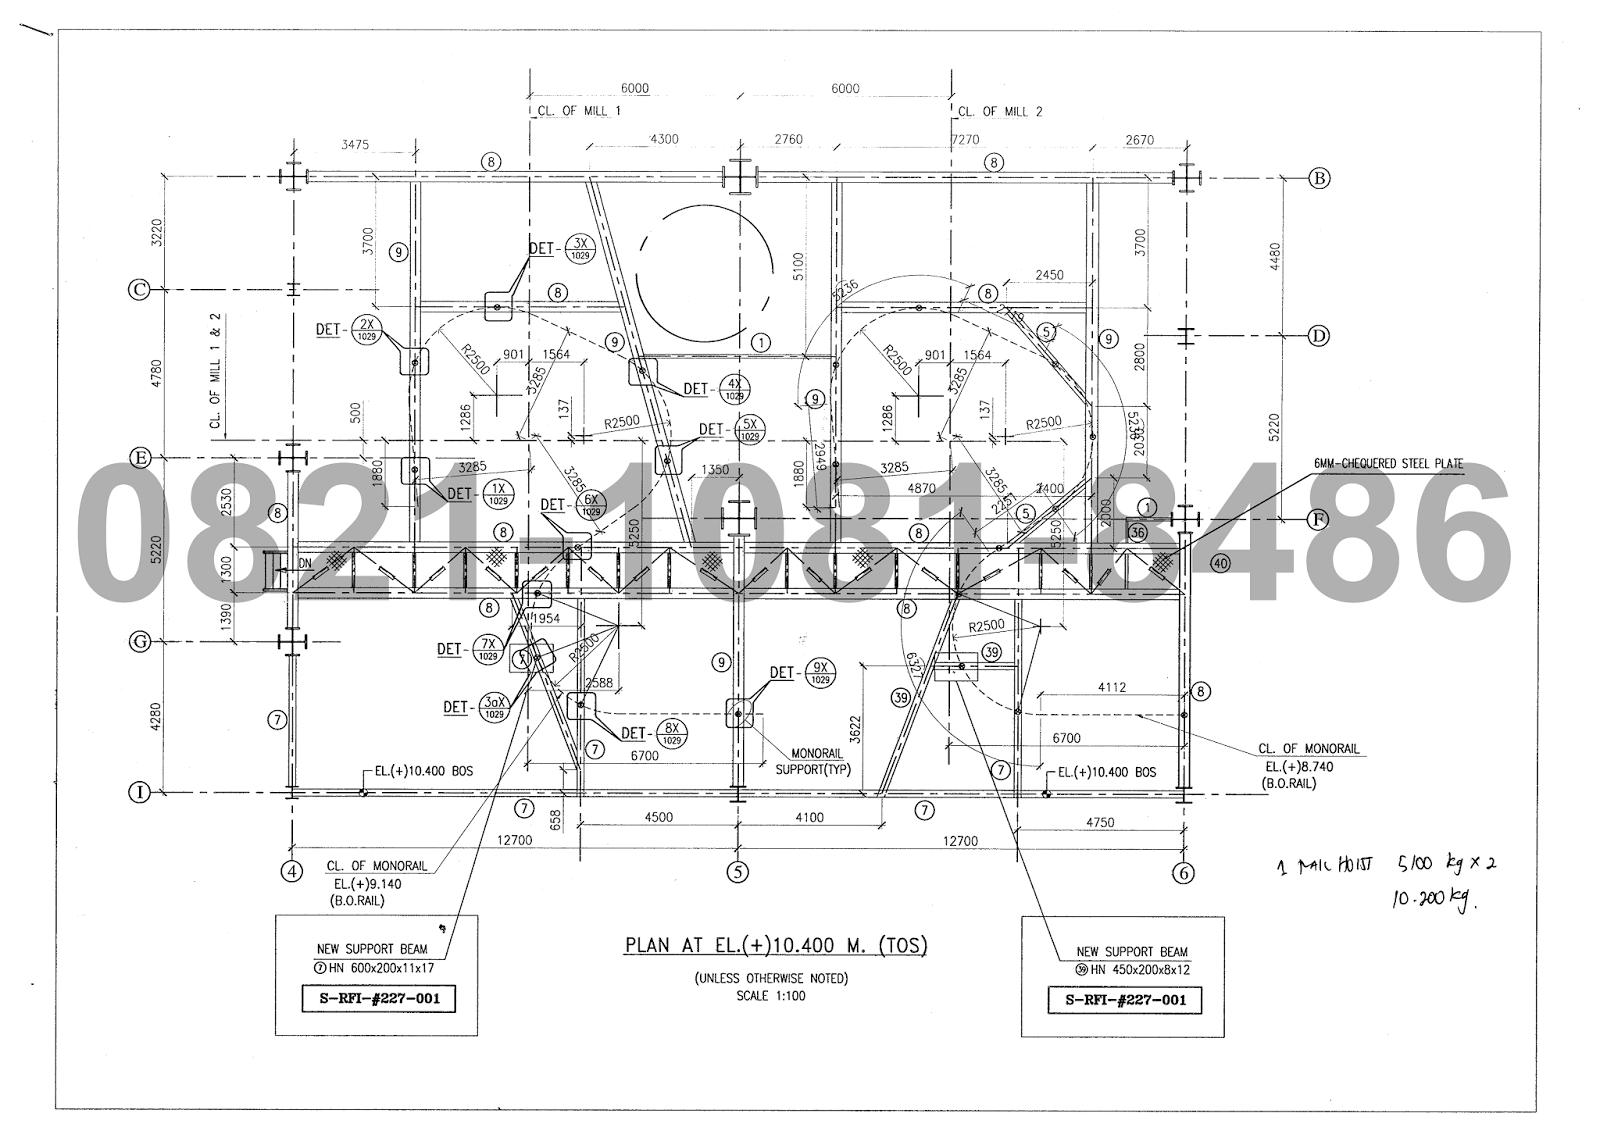 Vw Buggy Wiring Diagram 1600. Diagram. Auto Wiring Diagram